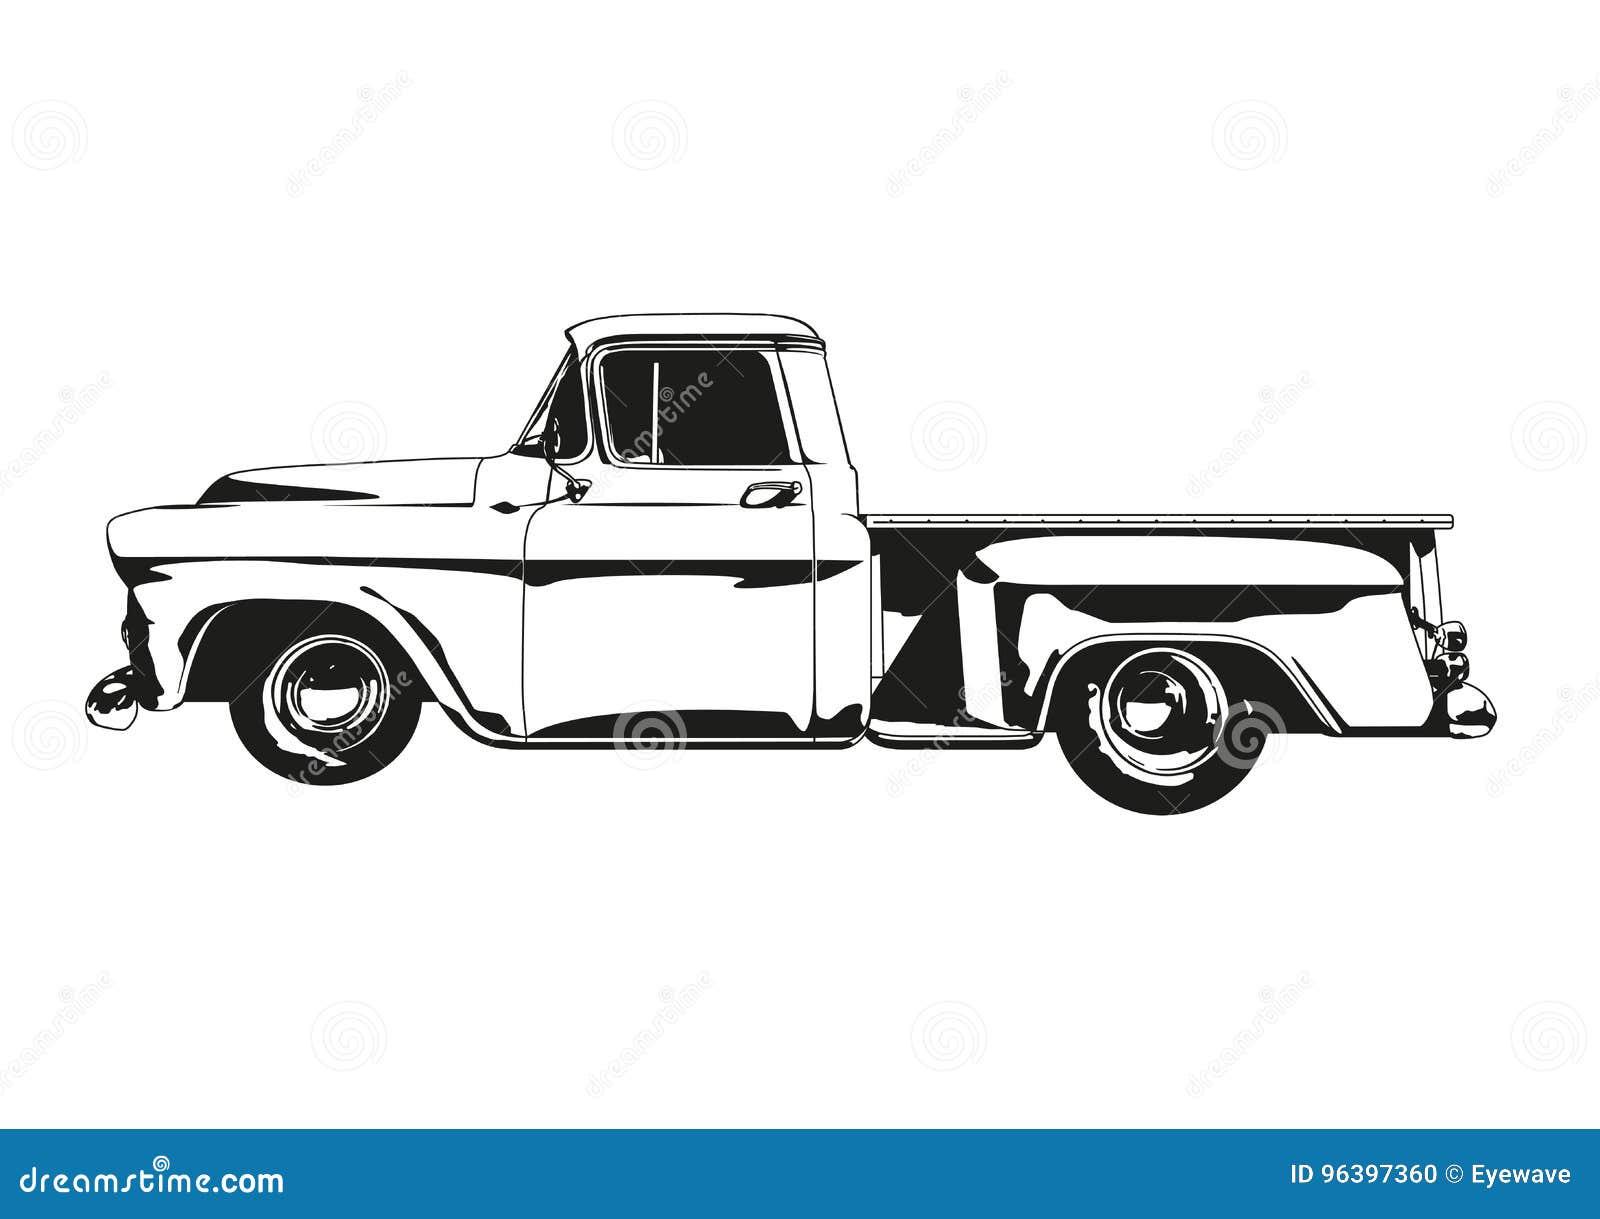 Vintage Hot Rod Pickup Truck Silhouette Vector Stock Vector Illustration Of Pickup Vector 96397360